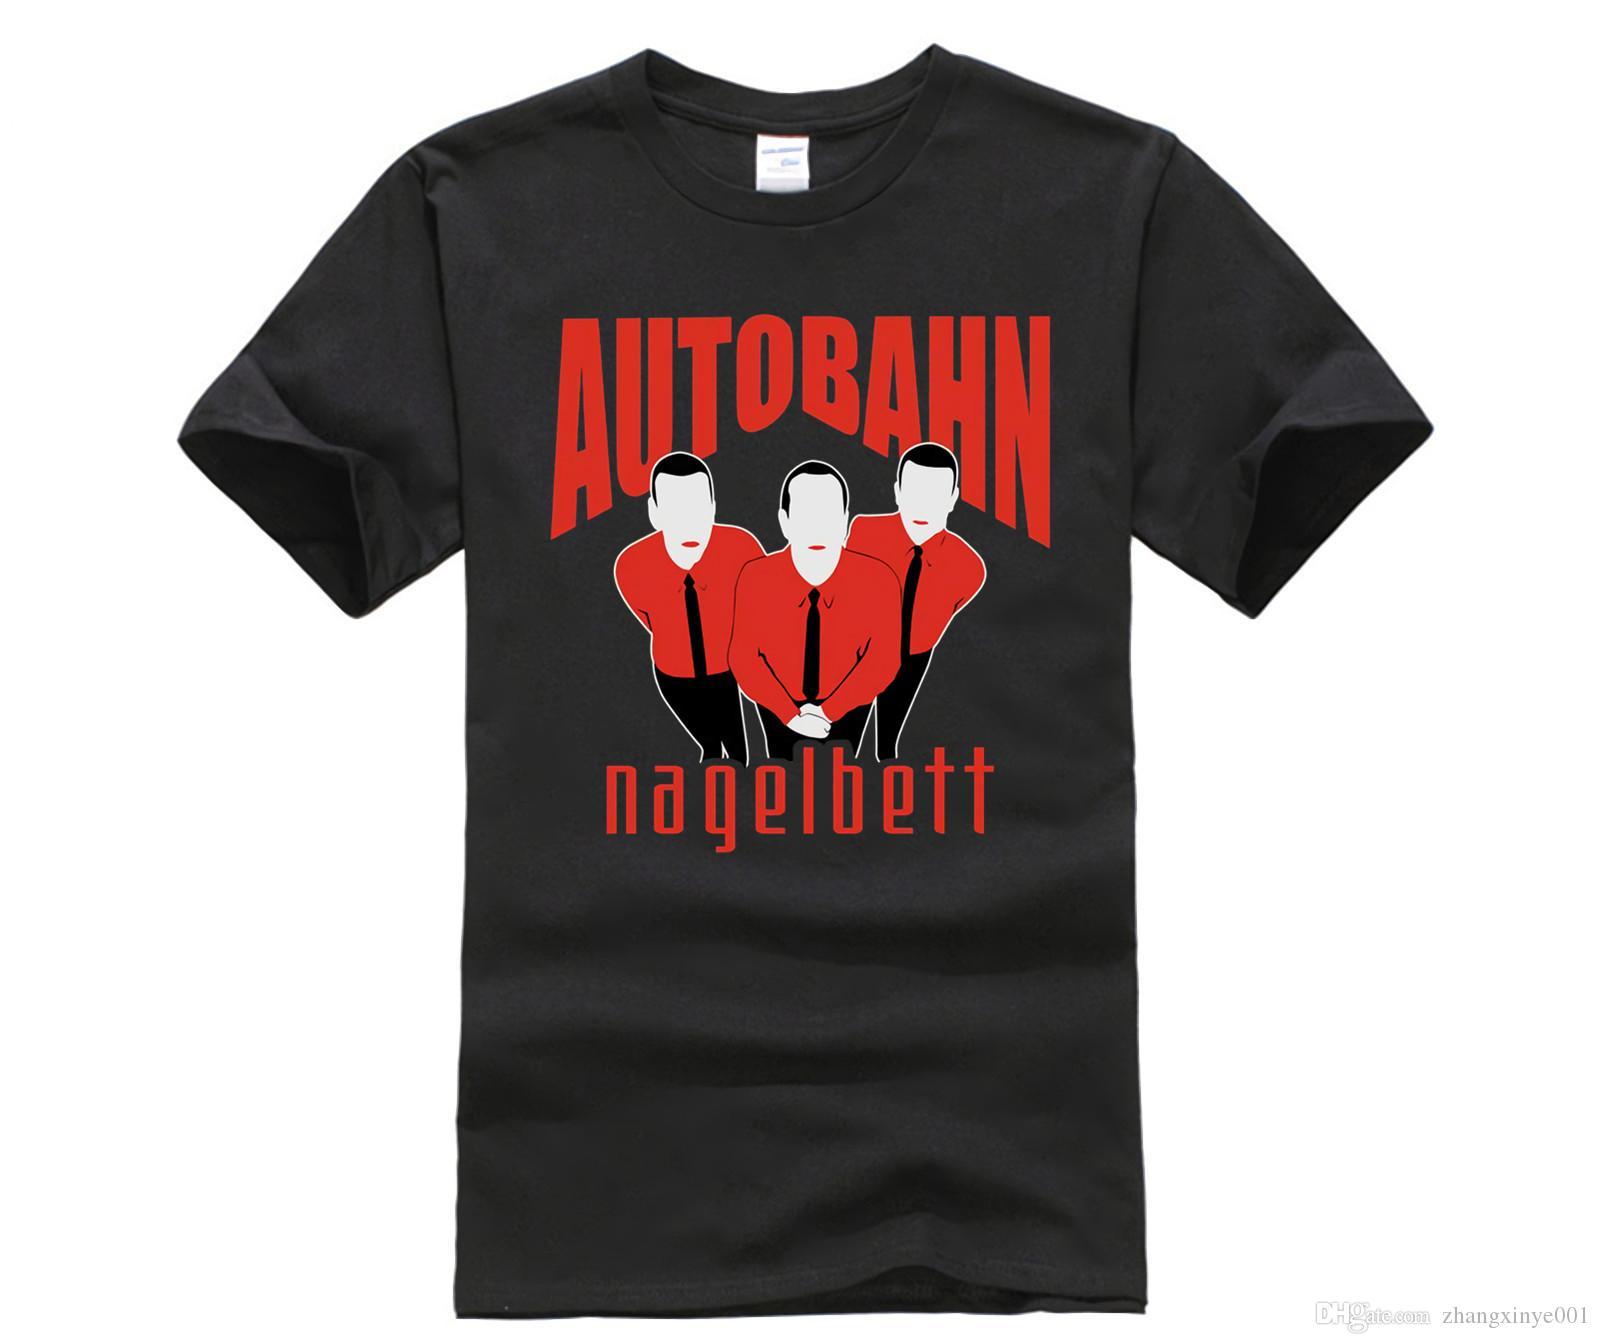 100 Cotton O Neck Printed T Shirt Big Lebowski T Shirt Autobahn